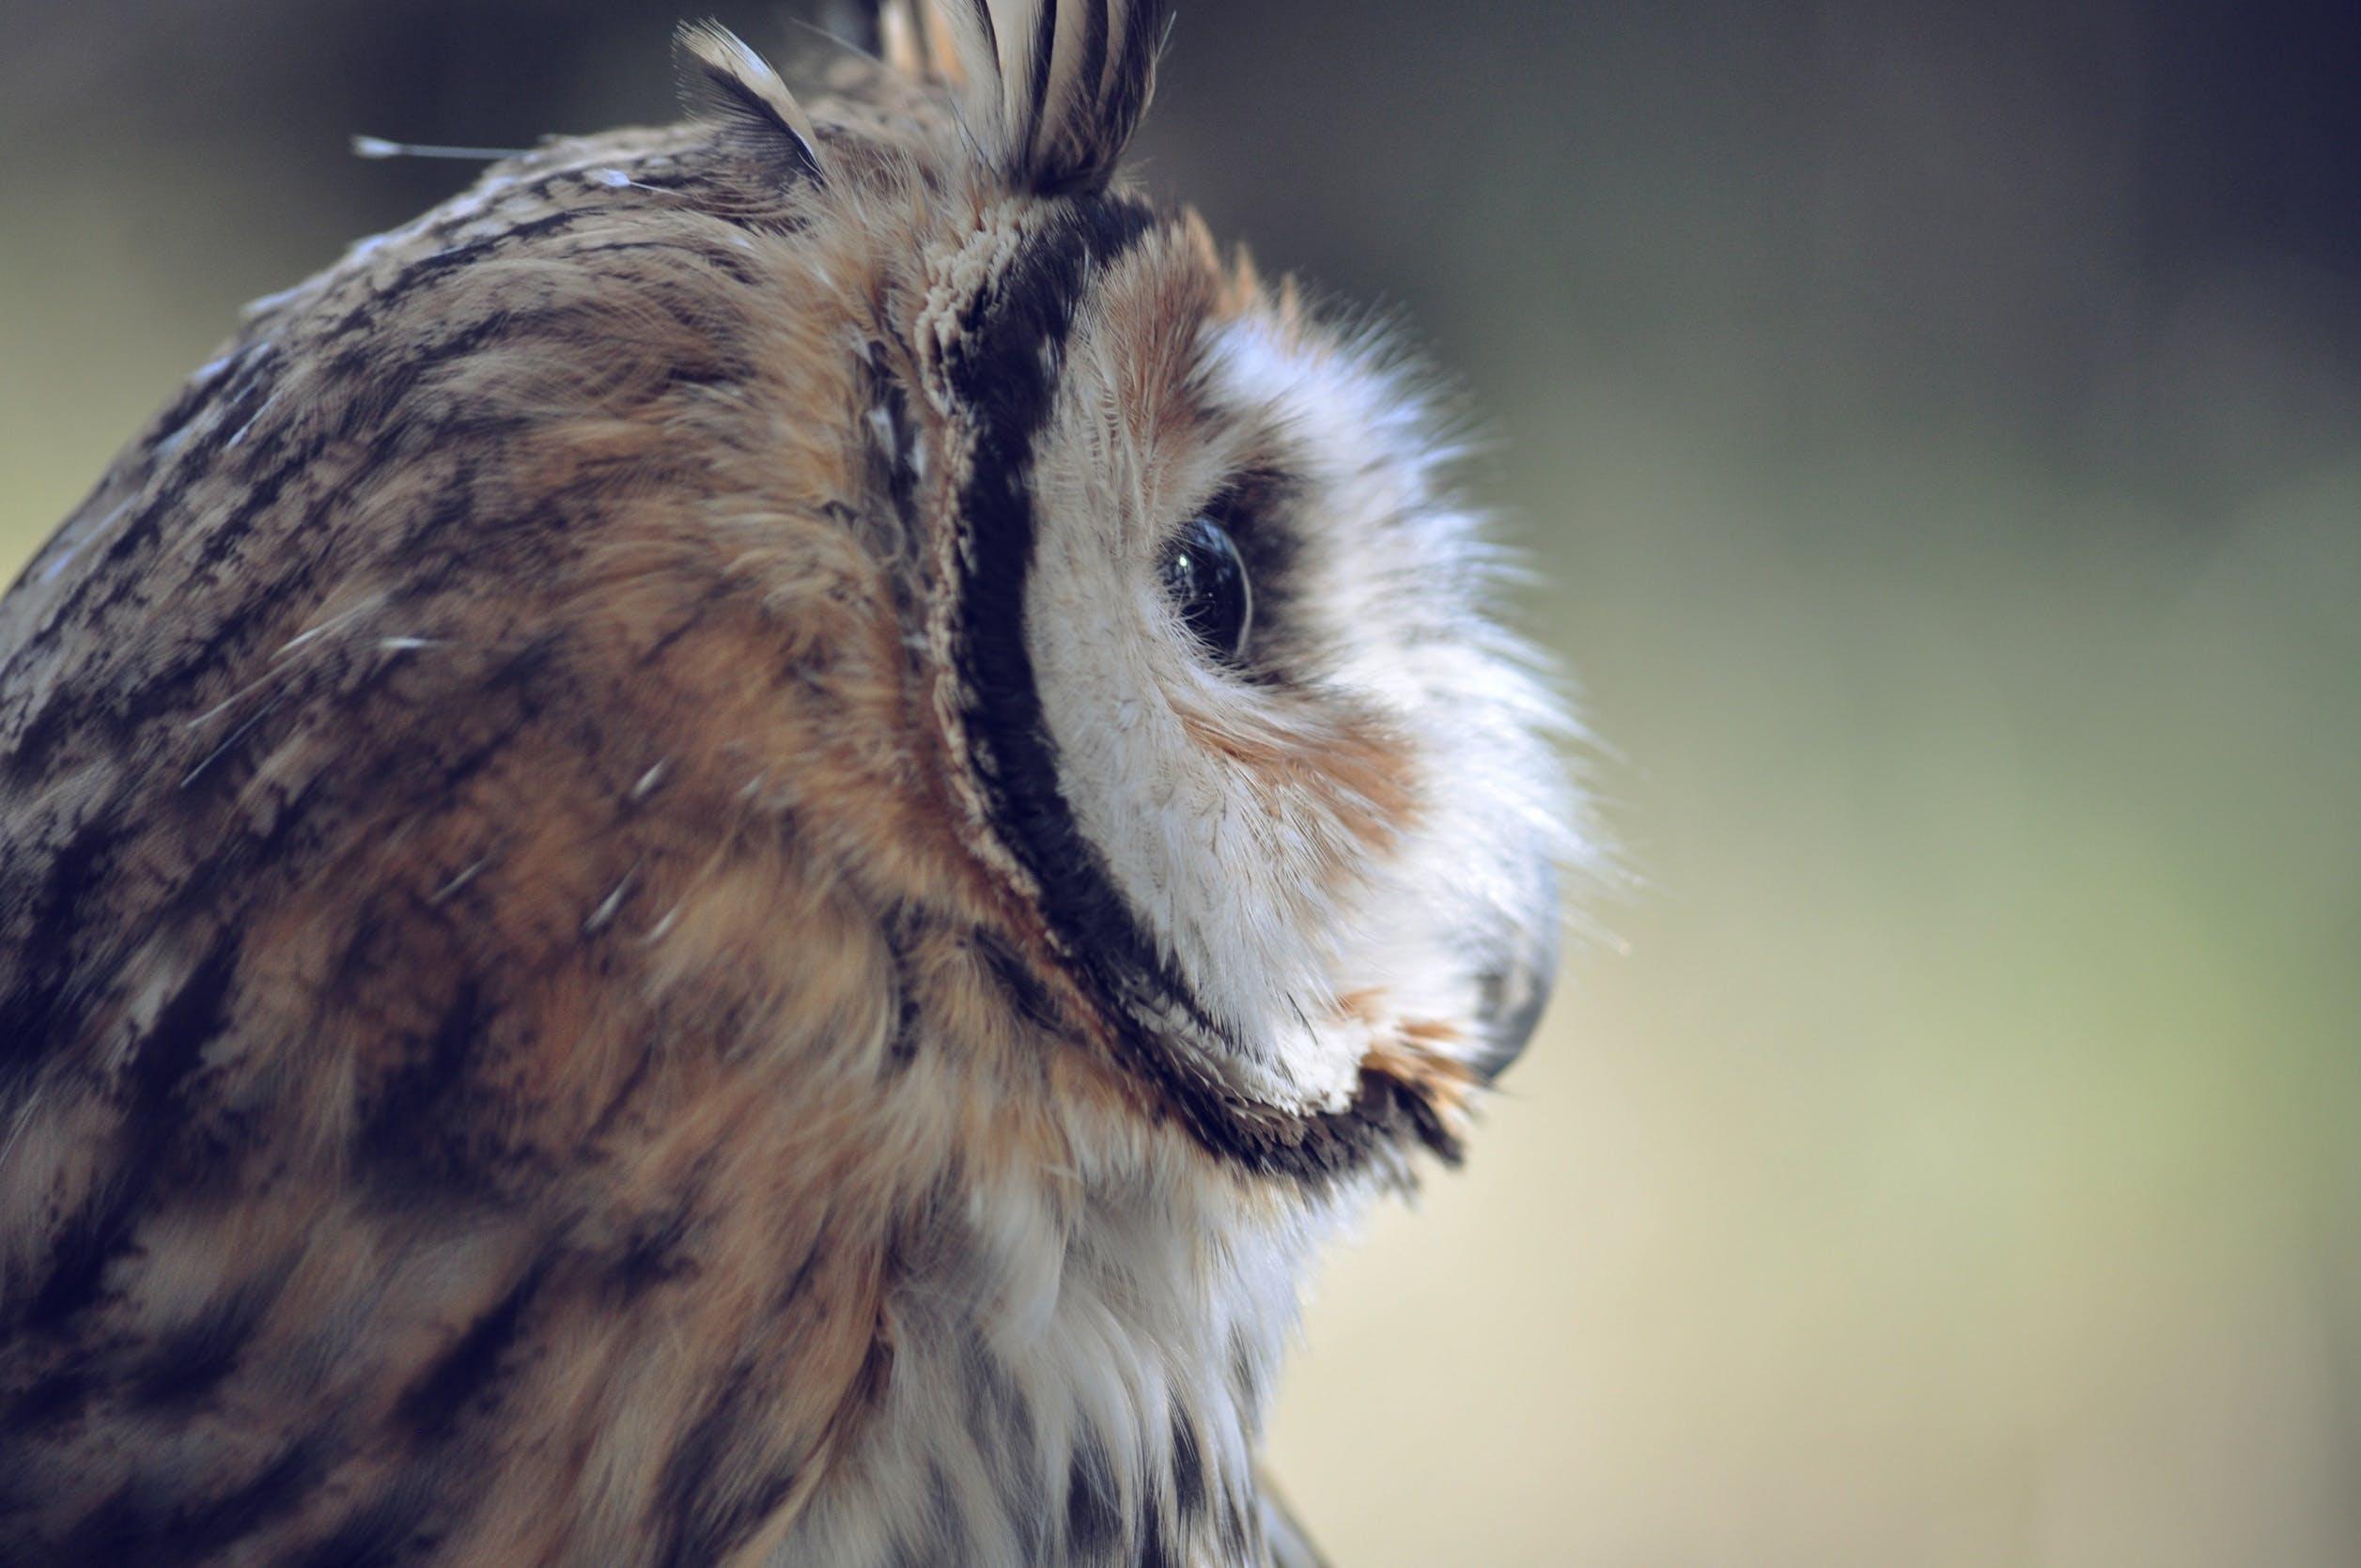 Free stock photo of animal, bird, face, feathers